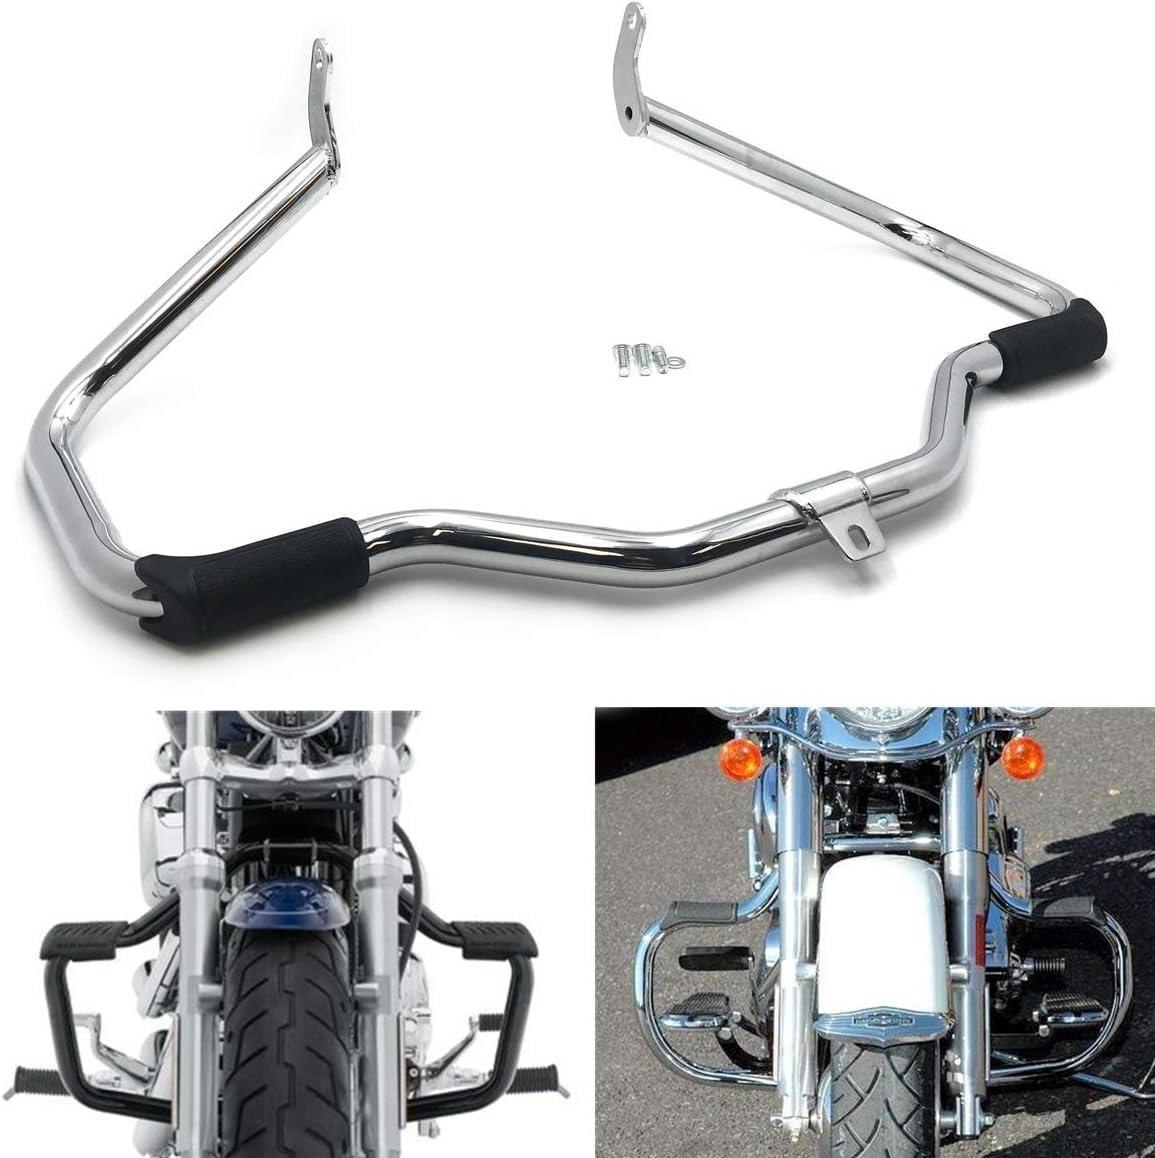 XKH Compatible with Gloss Black Engine Guard SOFTAIL Fat Boy FLSTF Harley Highway Crash Bar 00-17 B07NSGLCDX